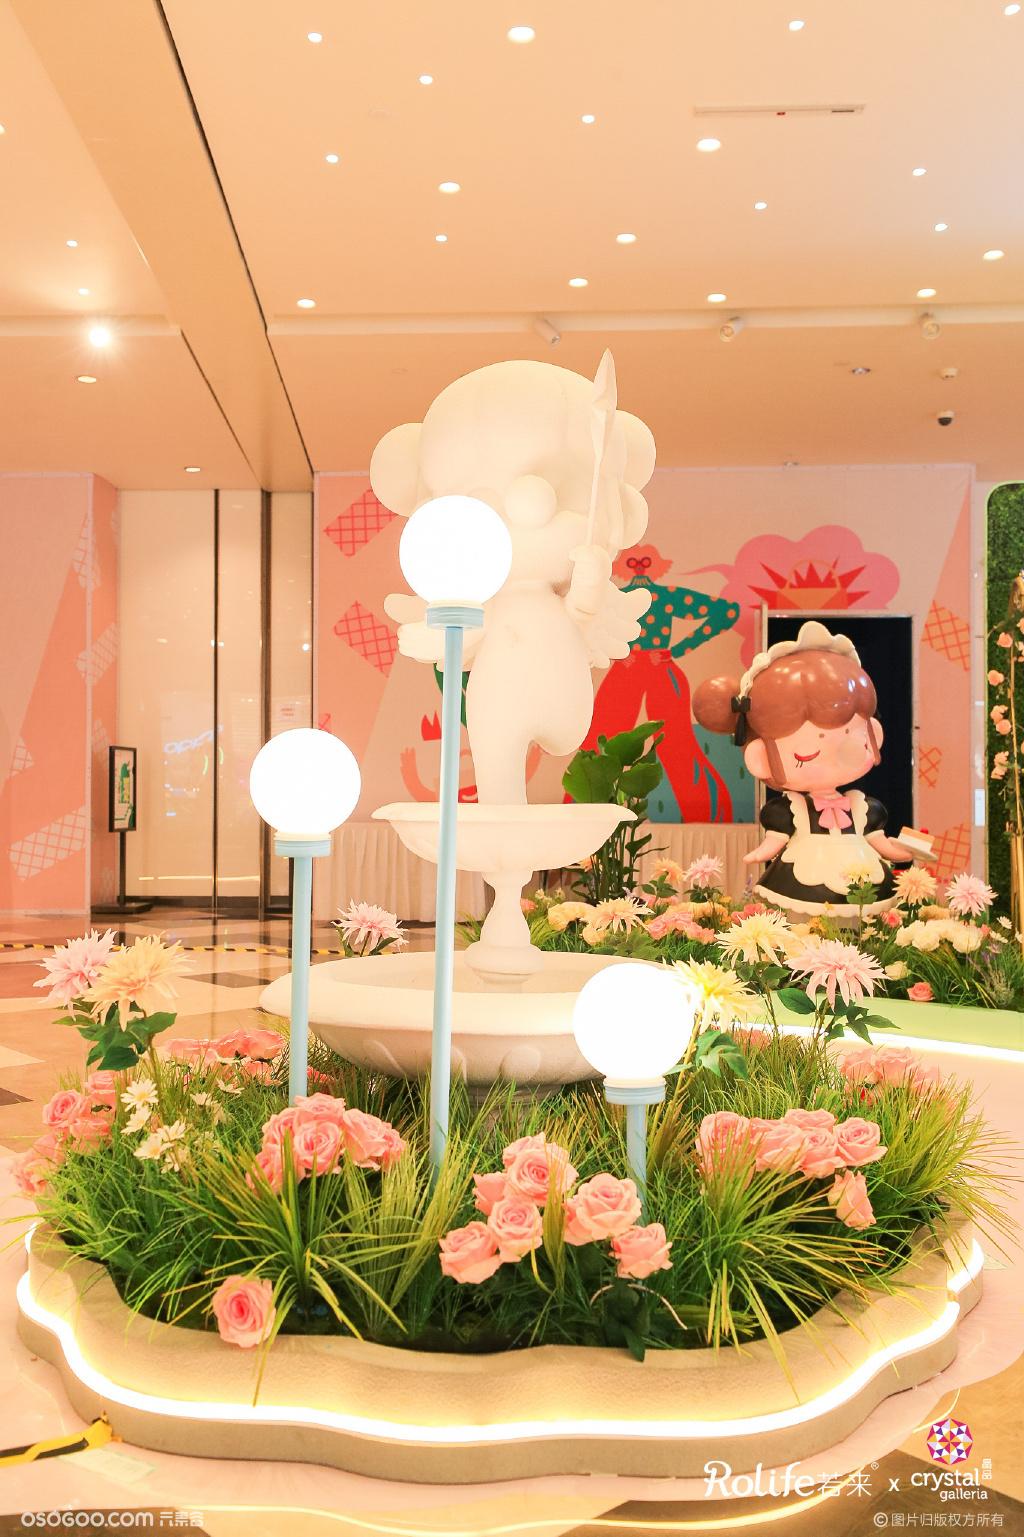 Nanci花园下午茶·上海晶品主题展